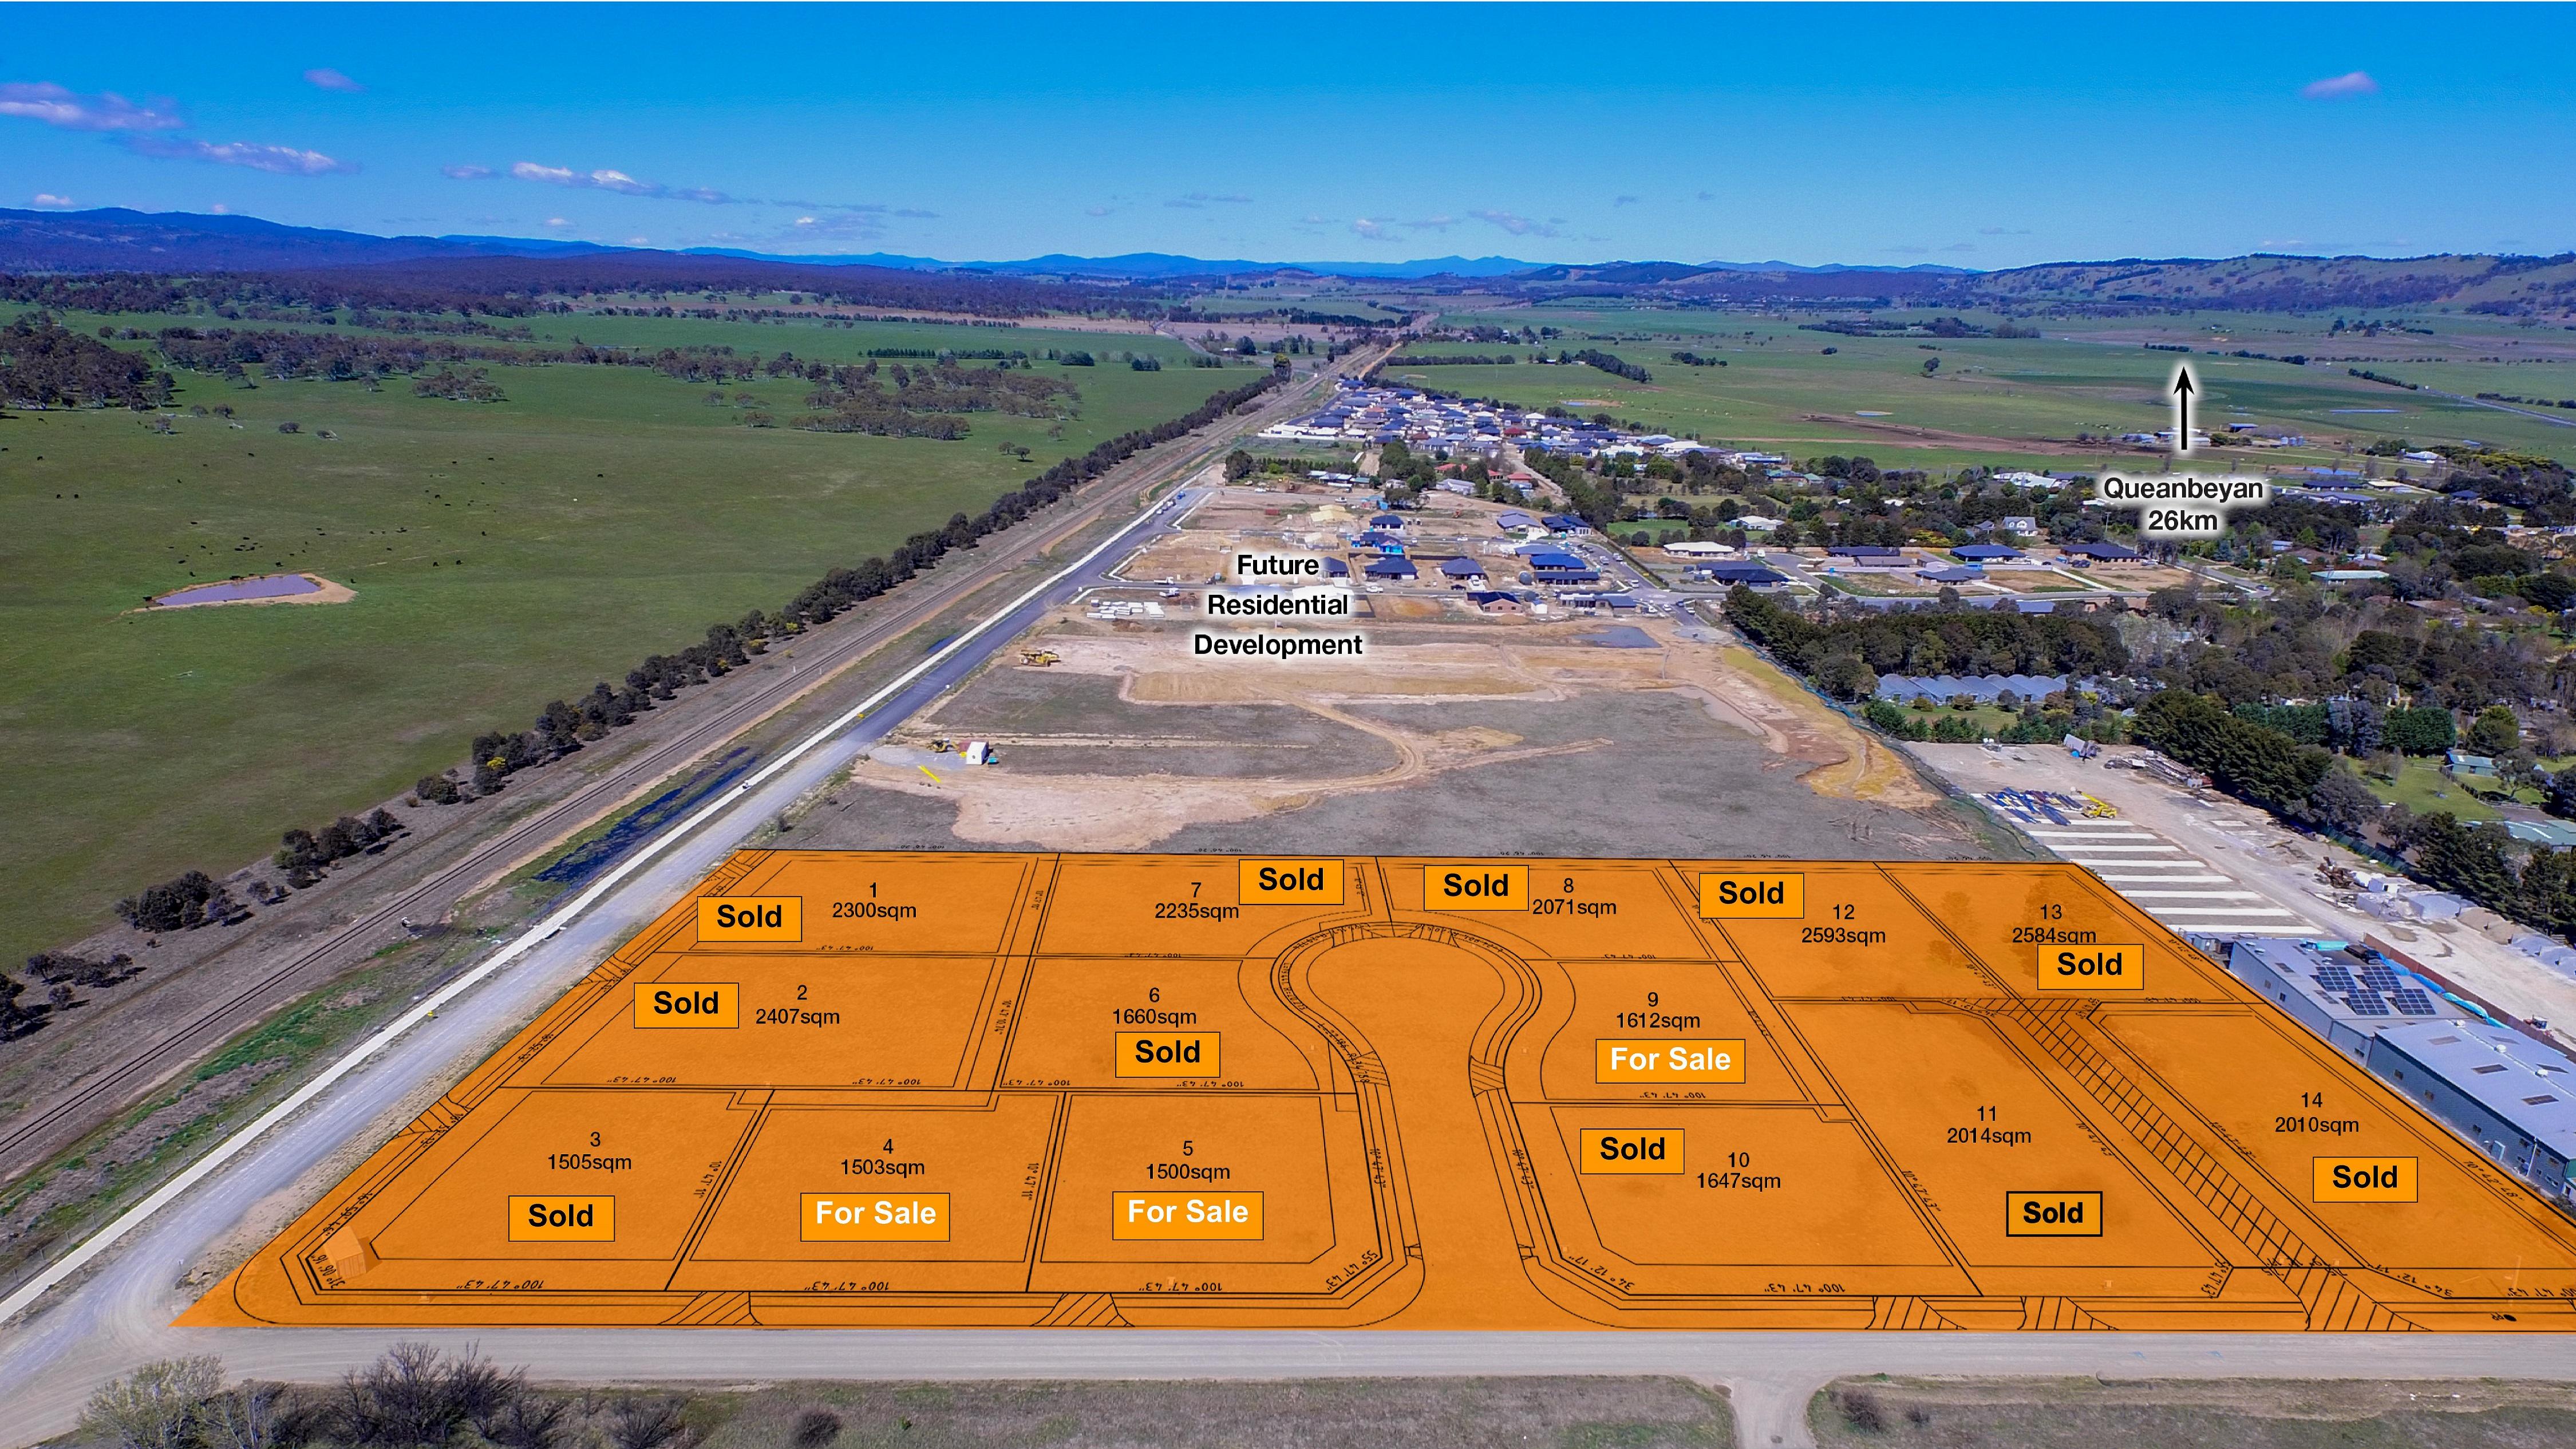 Land Development Opportunity – 3 Blocks Remaining!